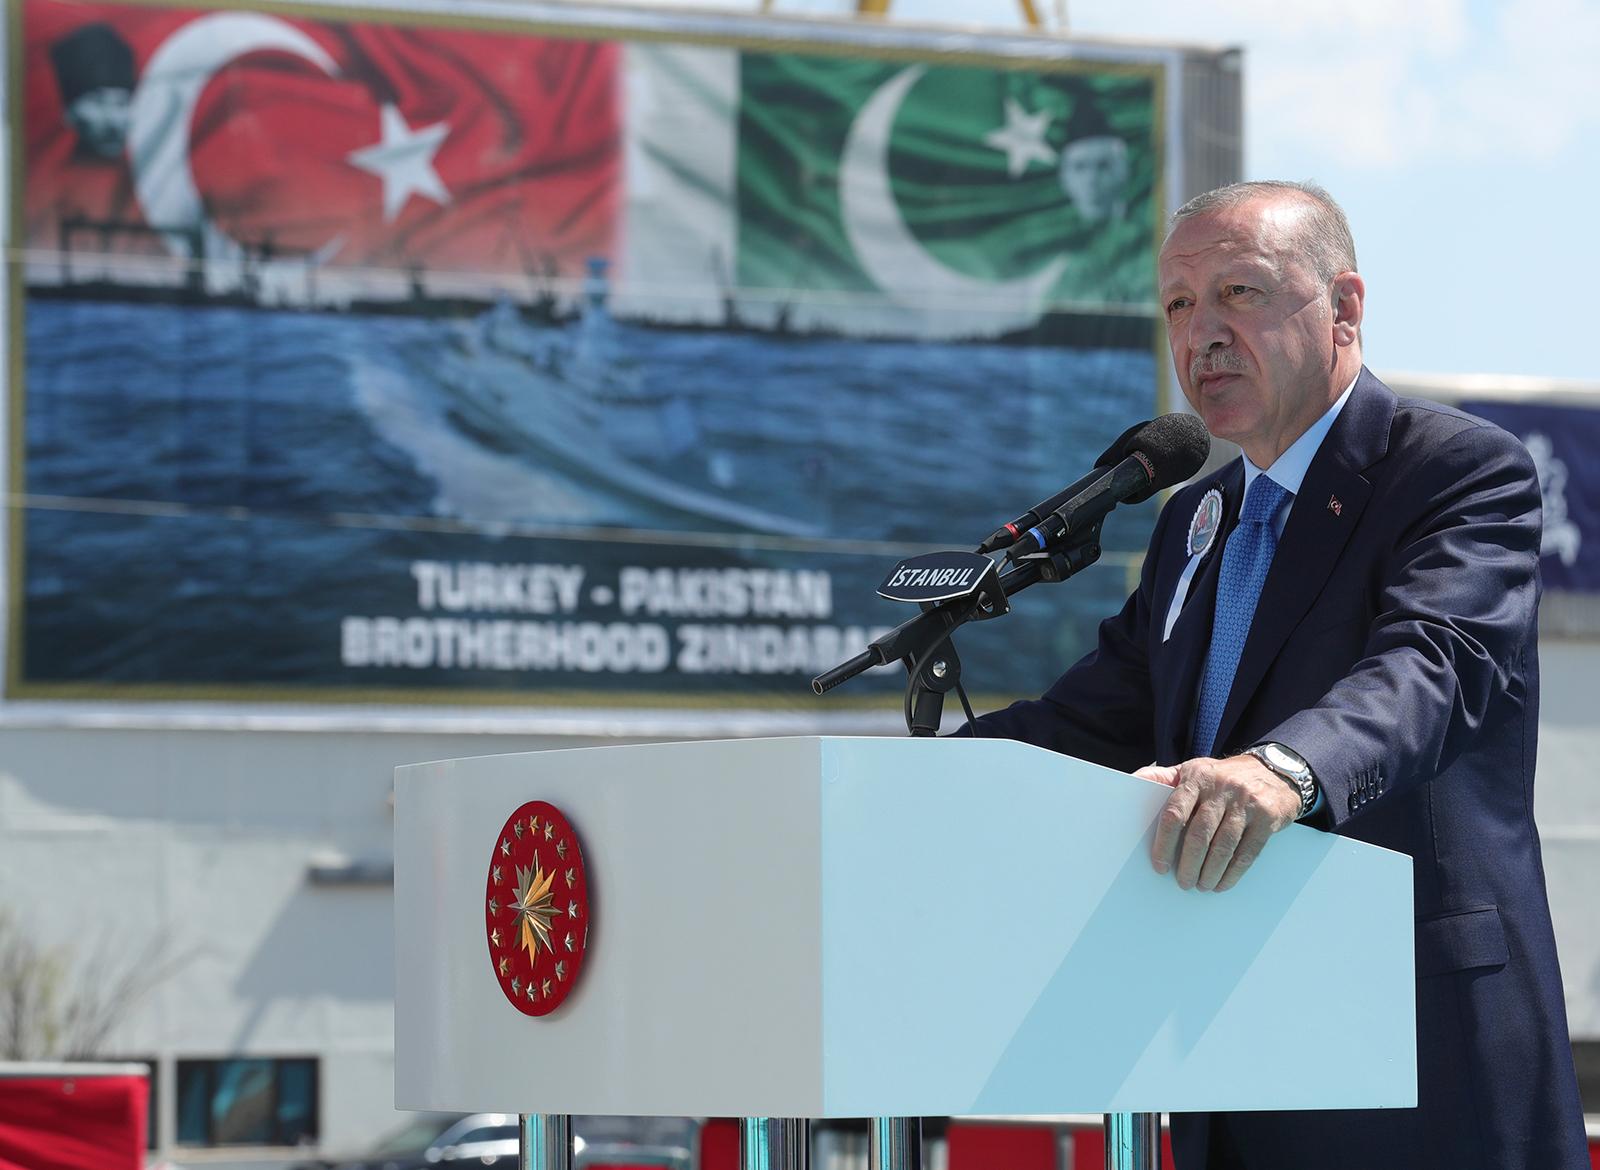 Turkey's President Recep Tayyip Erdogan speaks during a naval ceremony, in Istanbul, Turkey, on August 15.